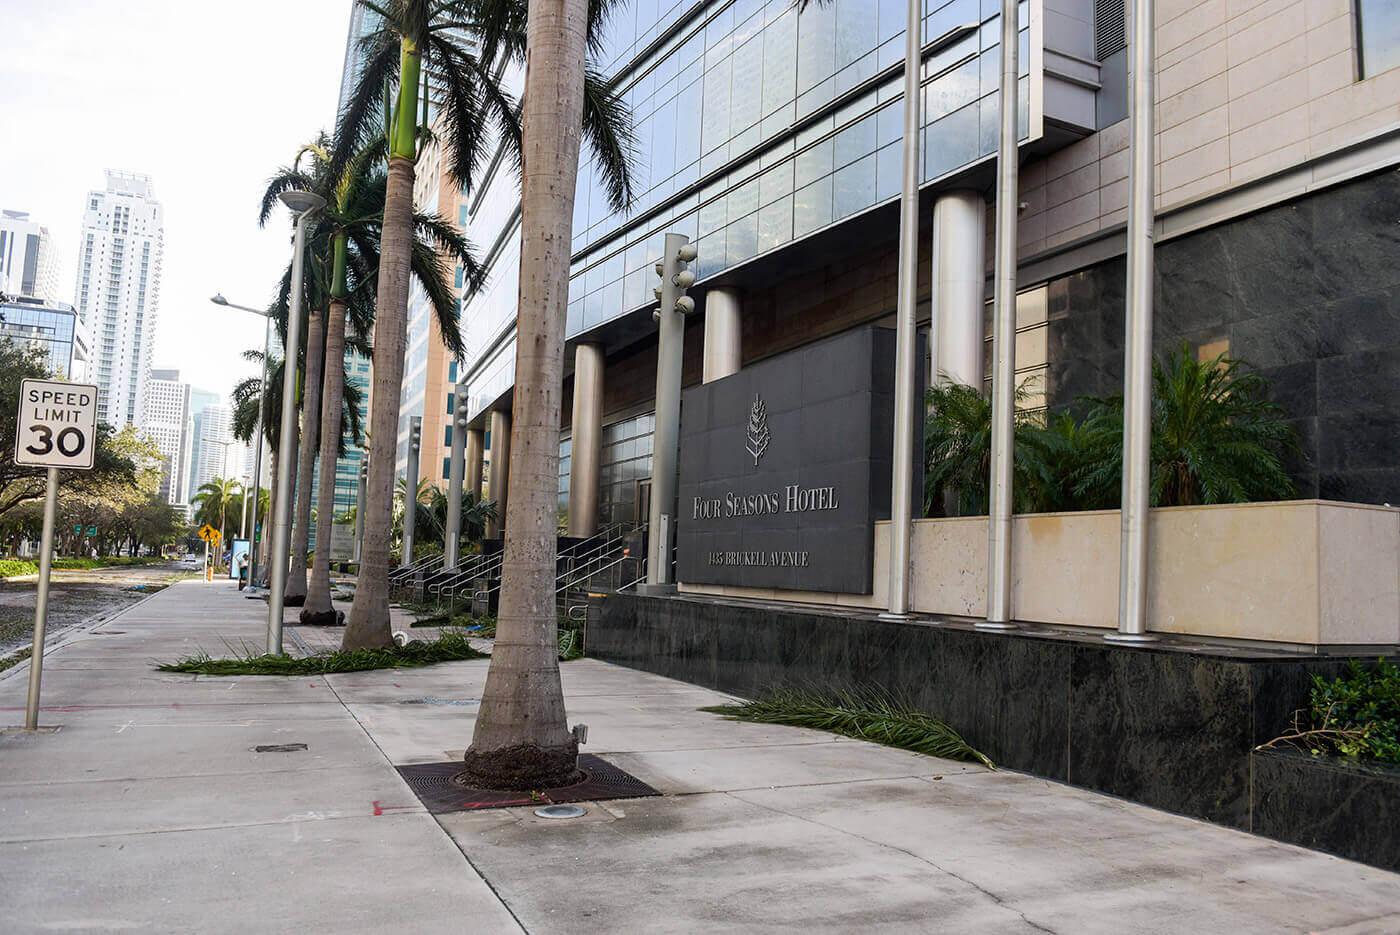 Corpus Christi Hurricane Harvey Property Damage Lawsuit